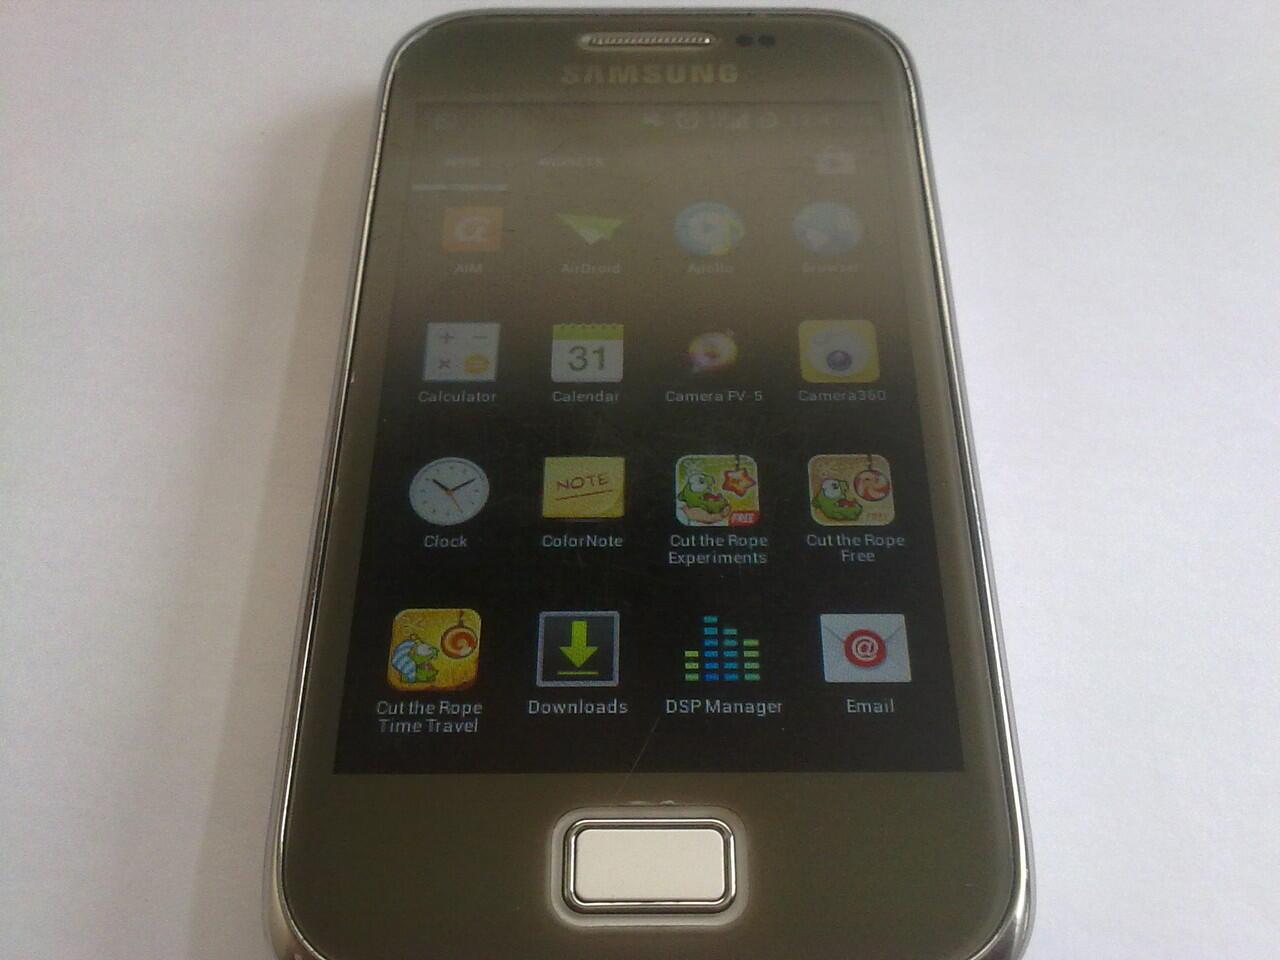 [WTS] Jual Cepat Samsung Galaxy Ace Plus